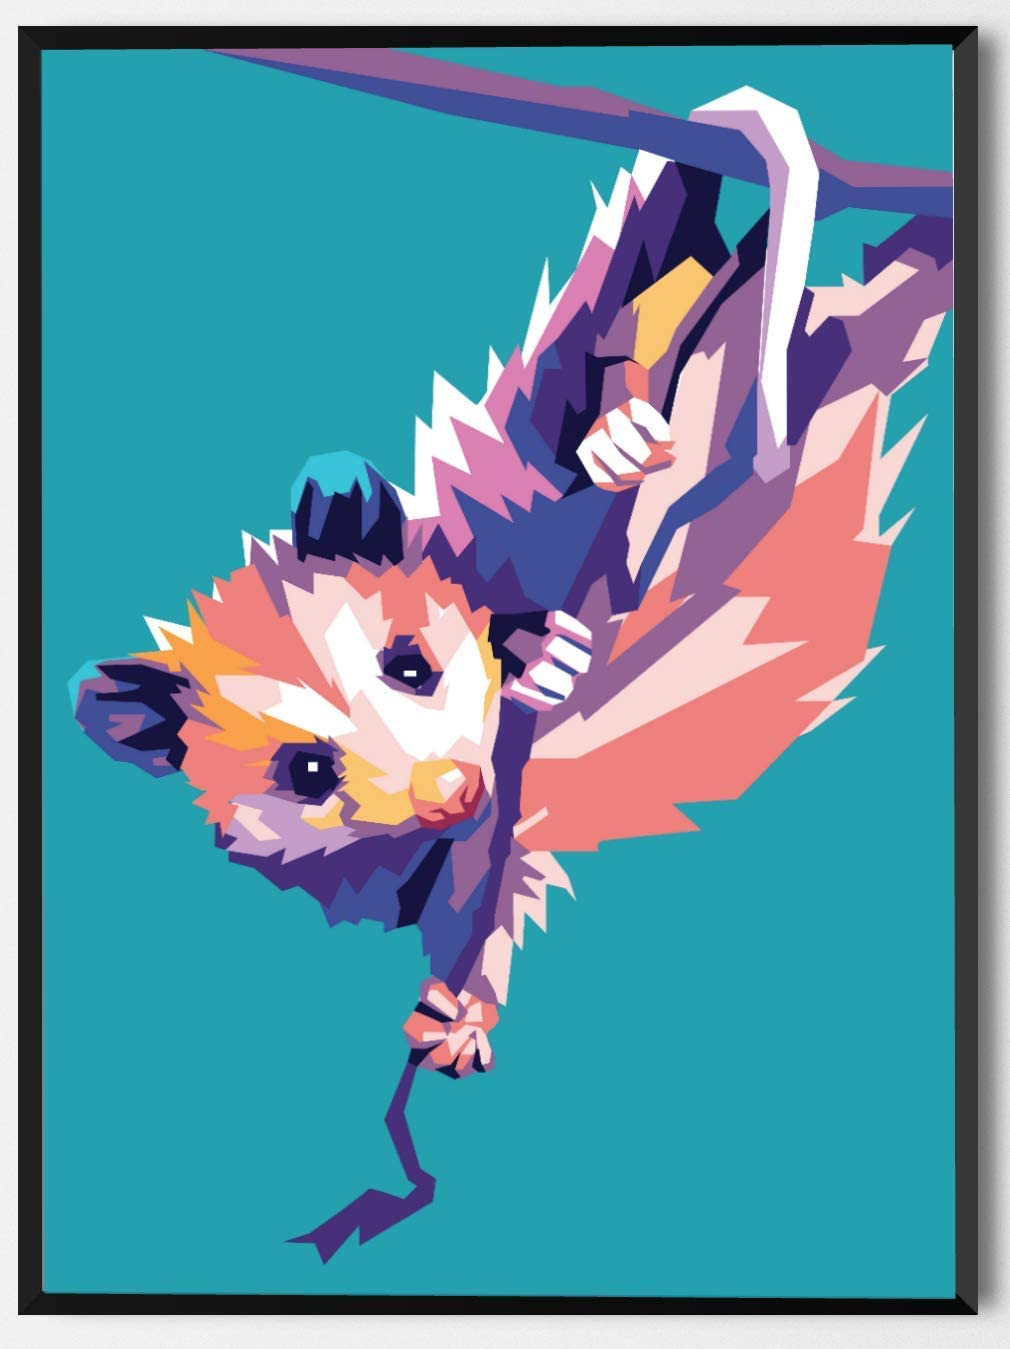 OMG Pop Prints Opossum Limited Poster Artwork - Professional Wall Art Merchandise (More (8x10)